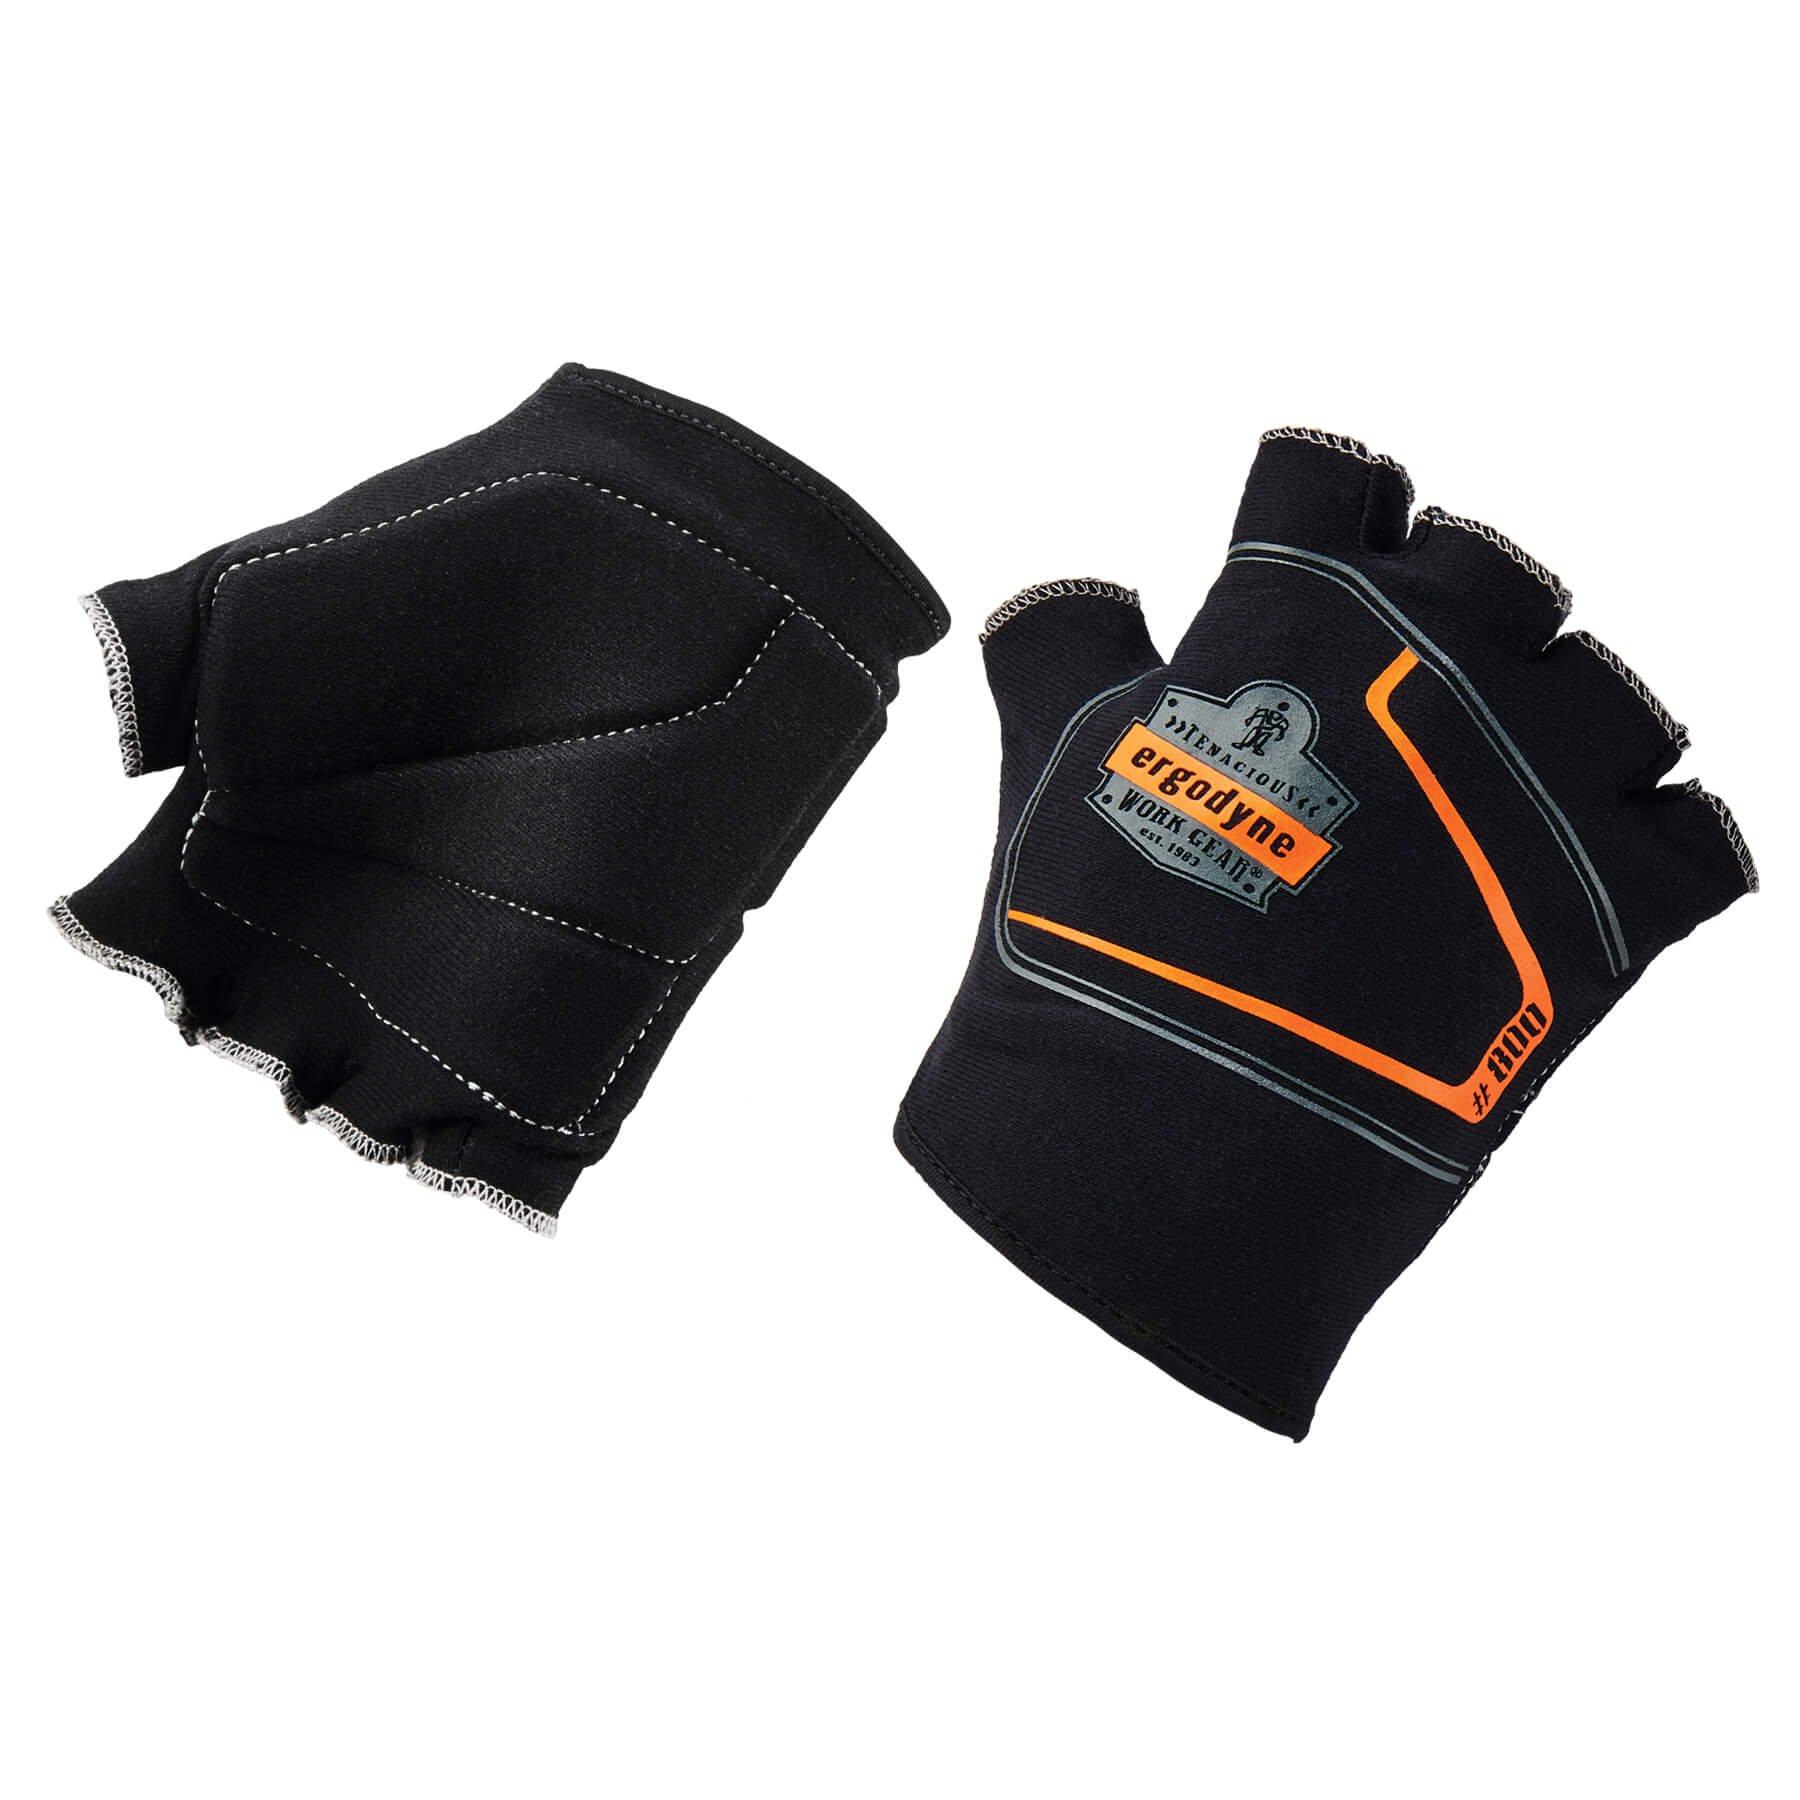 Ergodyne ProFlex 800 Padded Work Glove Liners, Large